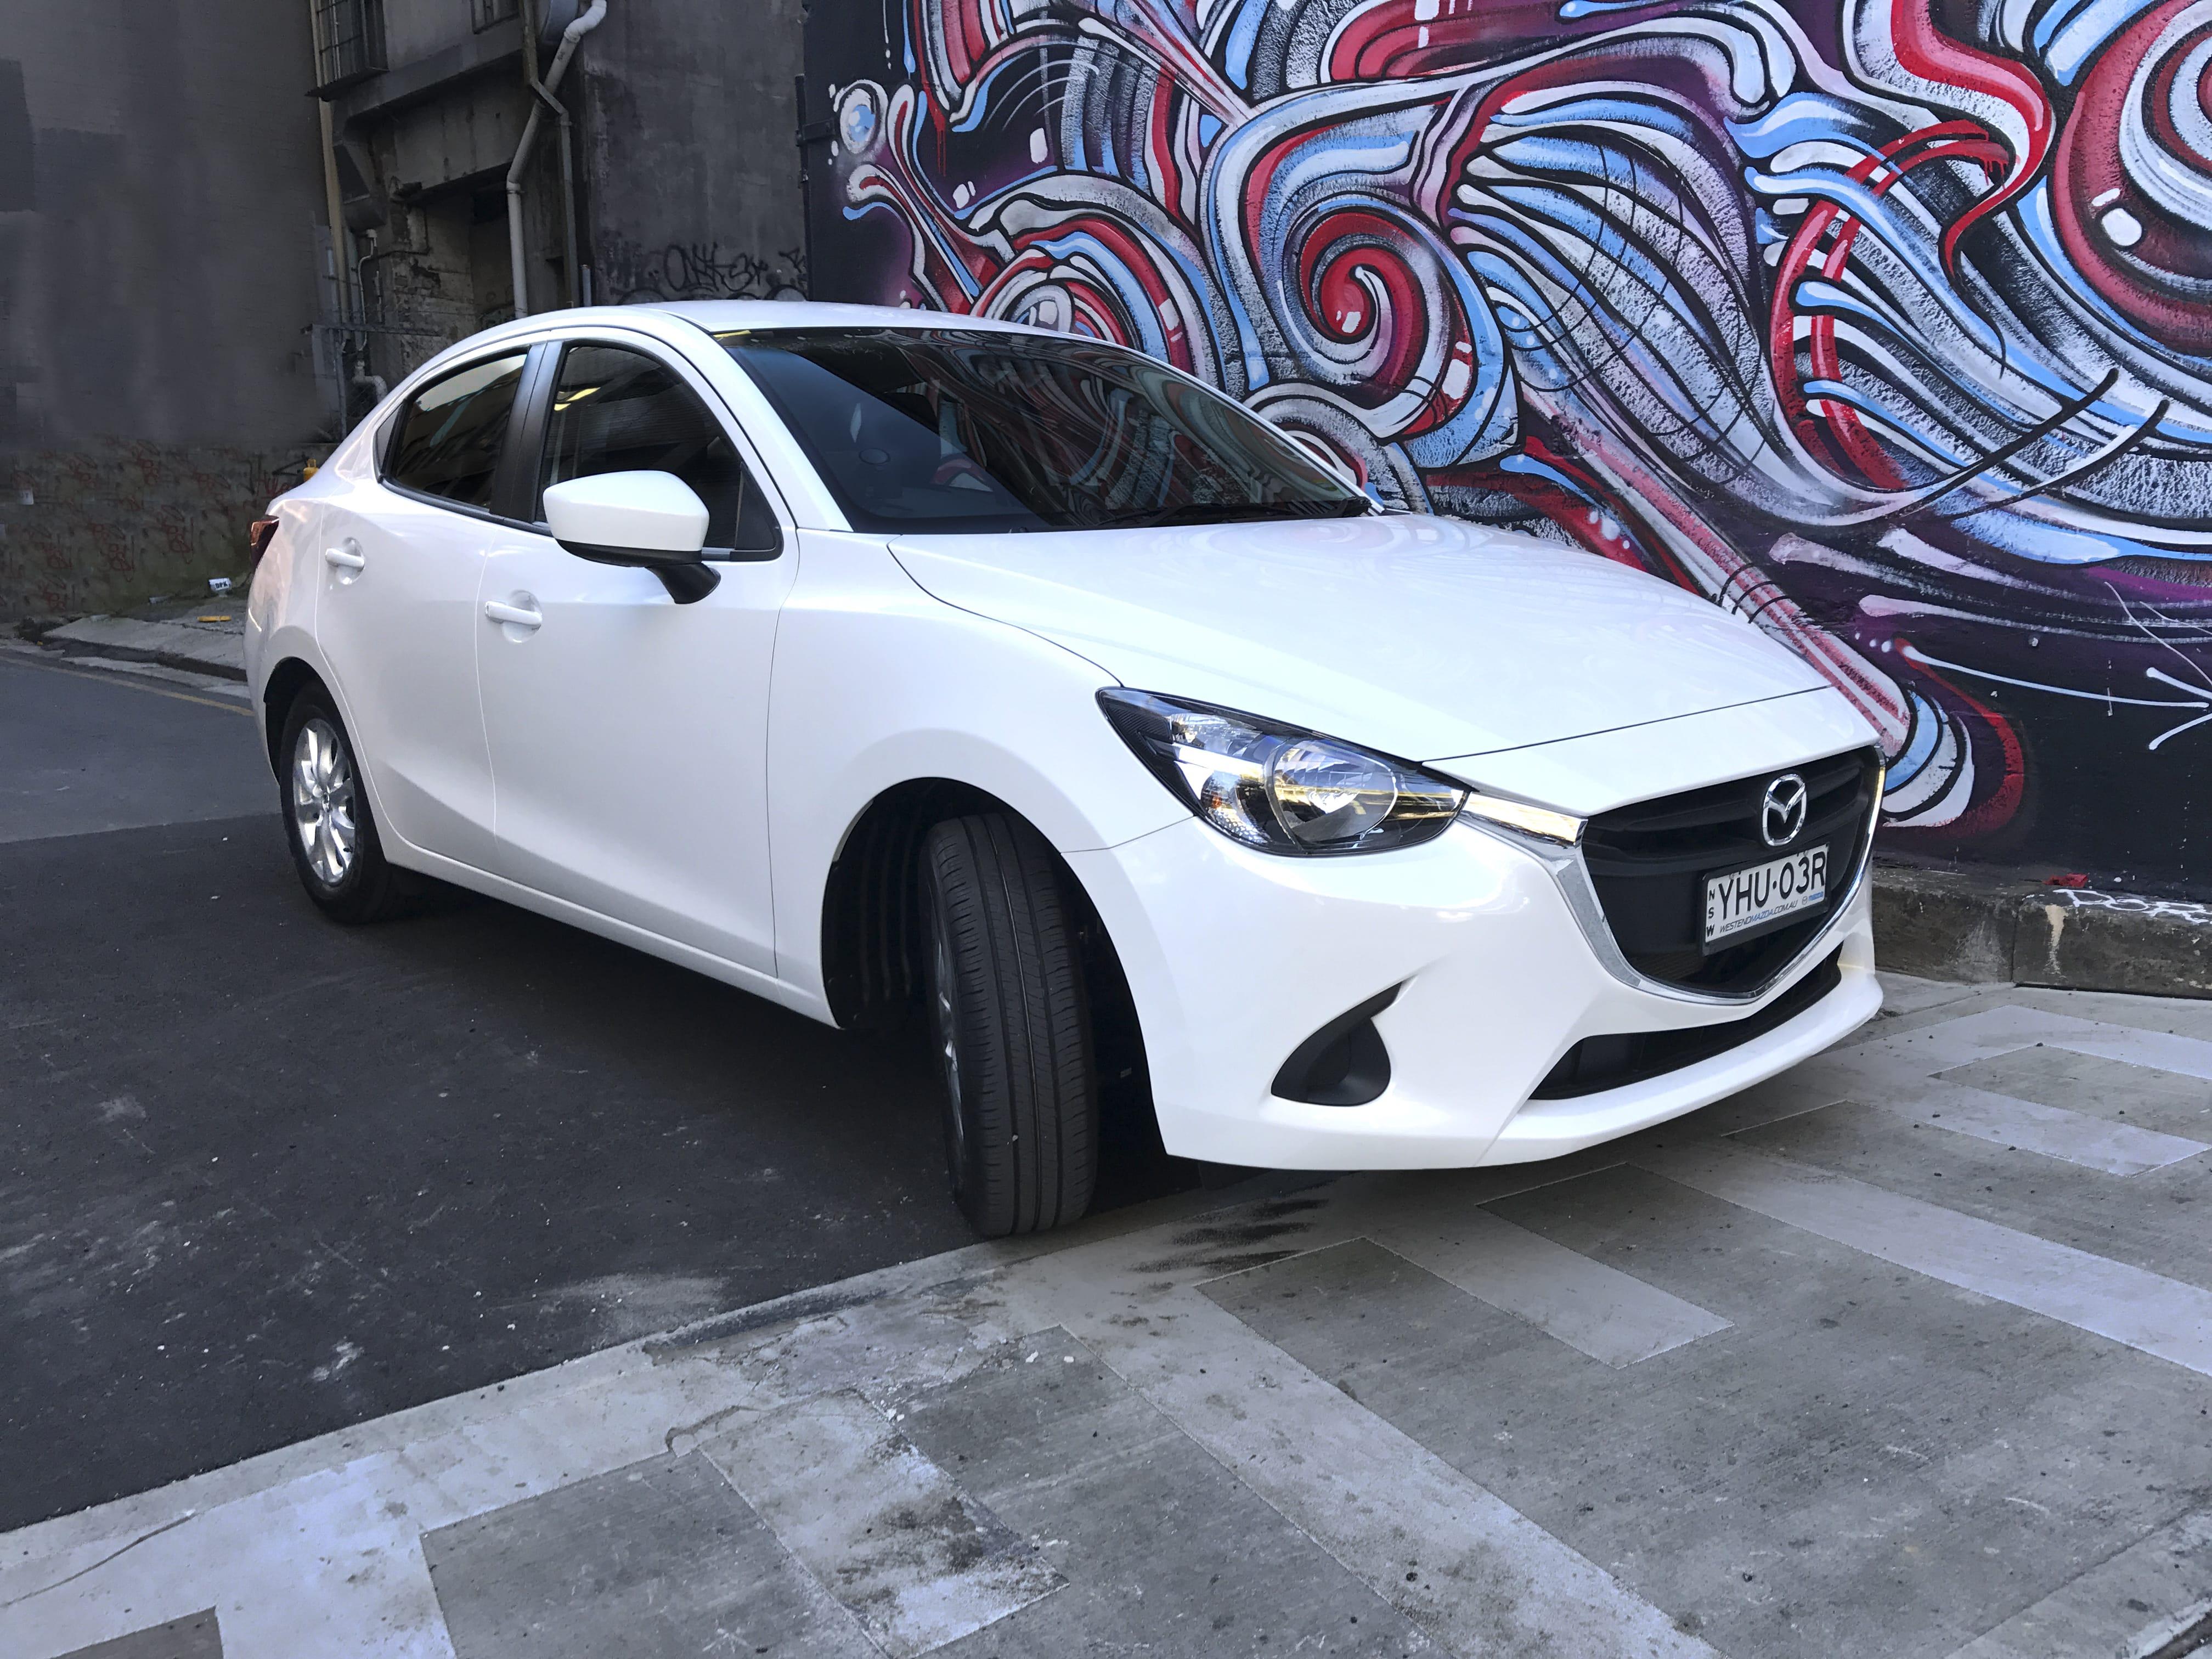 Picture of Julia's 2017 Mazda 2 Sedan